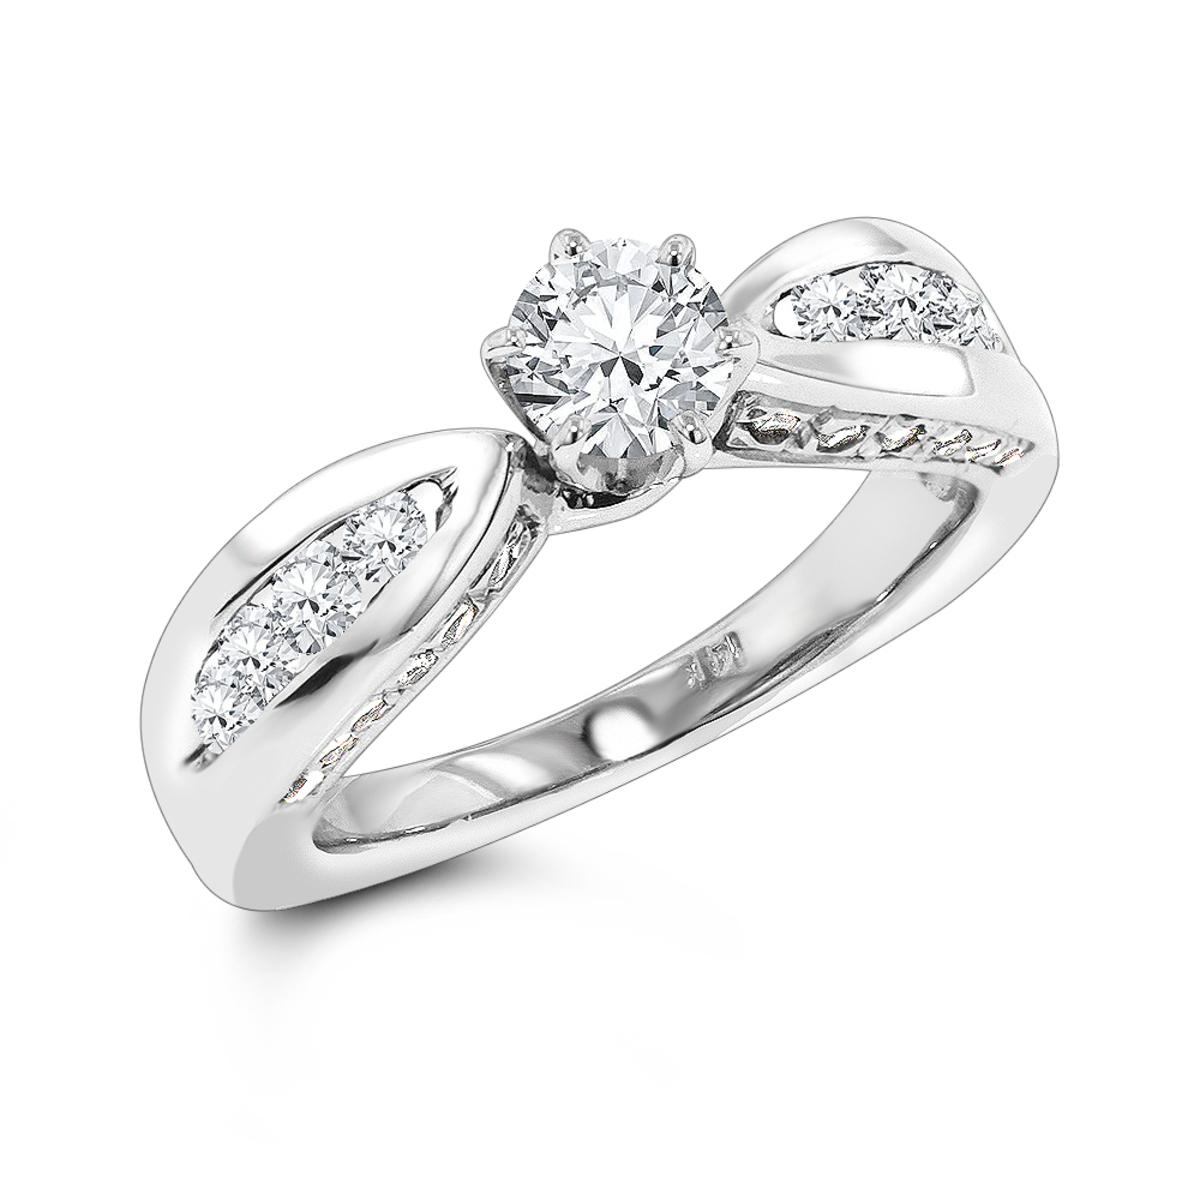 14K Gold Diamond Engagement Ring 1.24ct